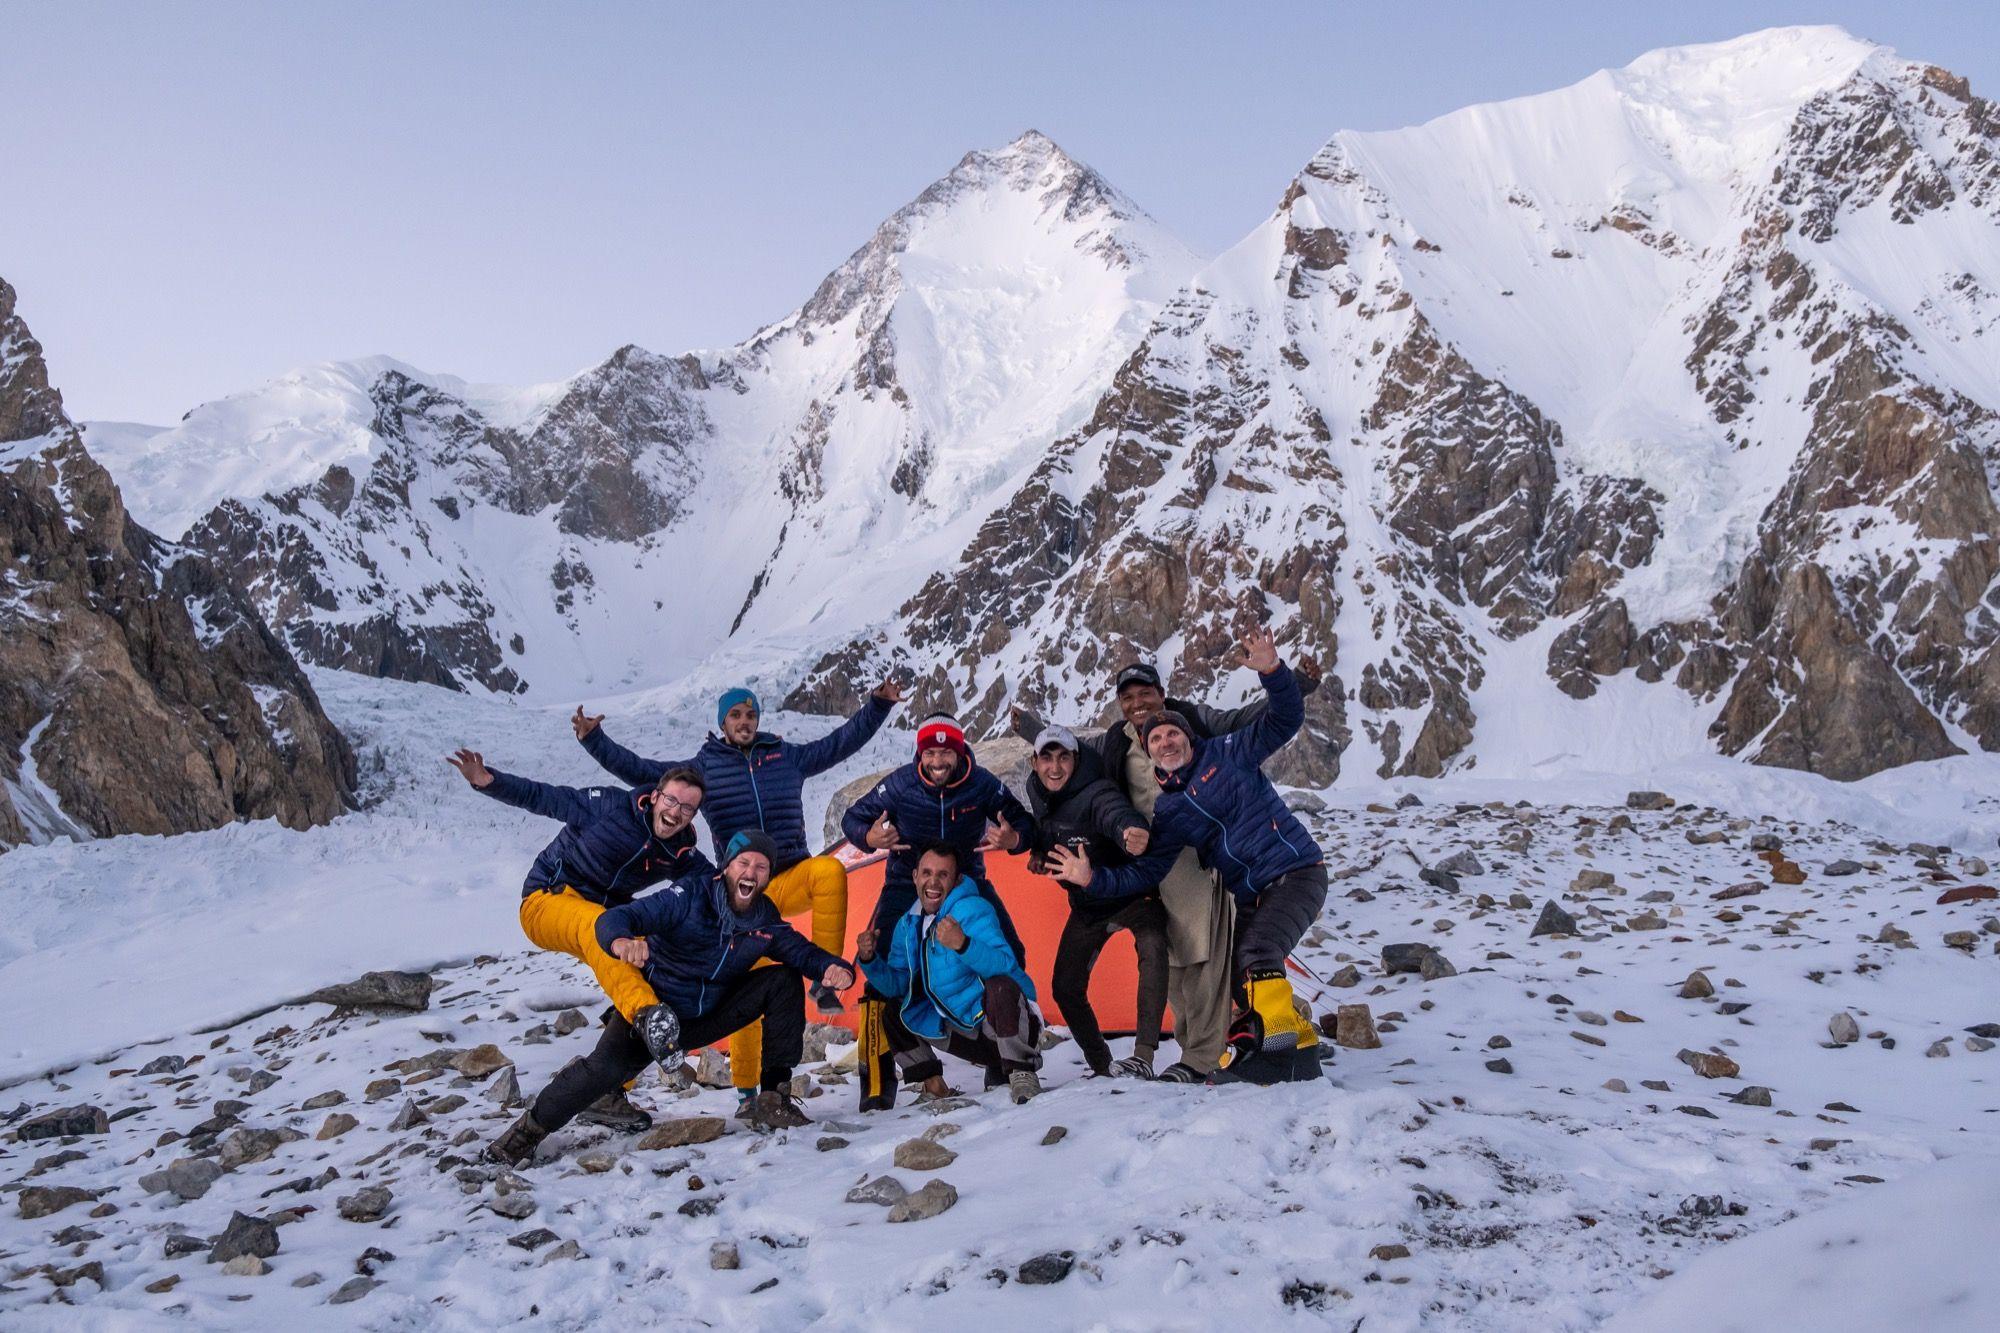 Vítek Dubec - Expedice na Gasherbrum II v Pákistánu